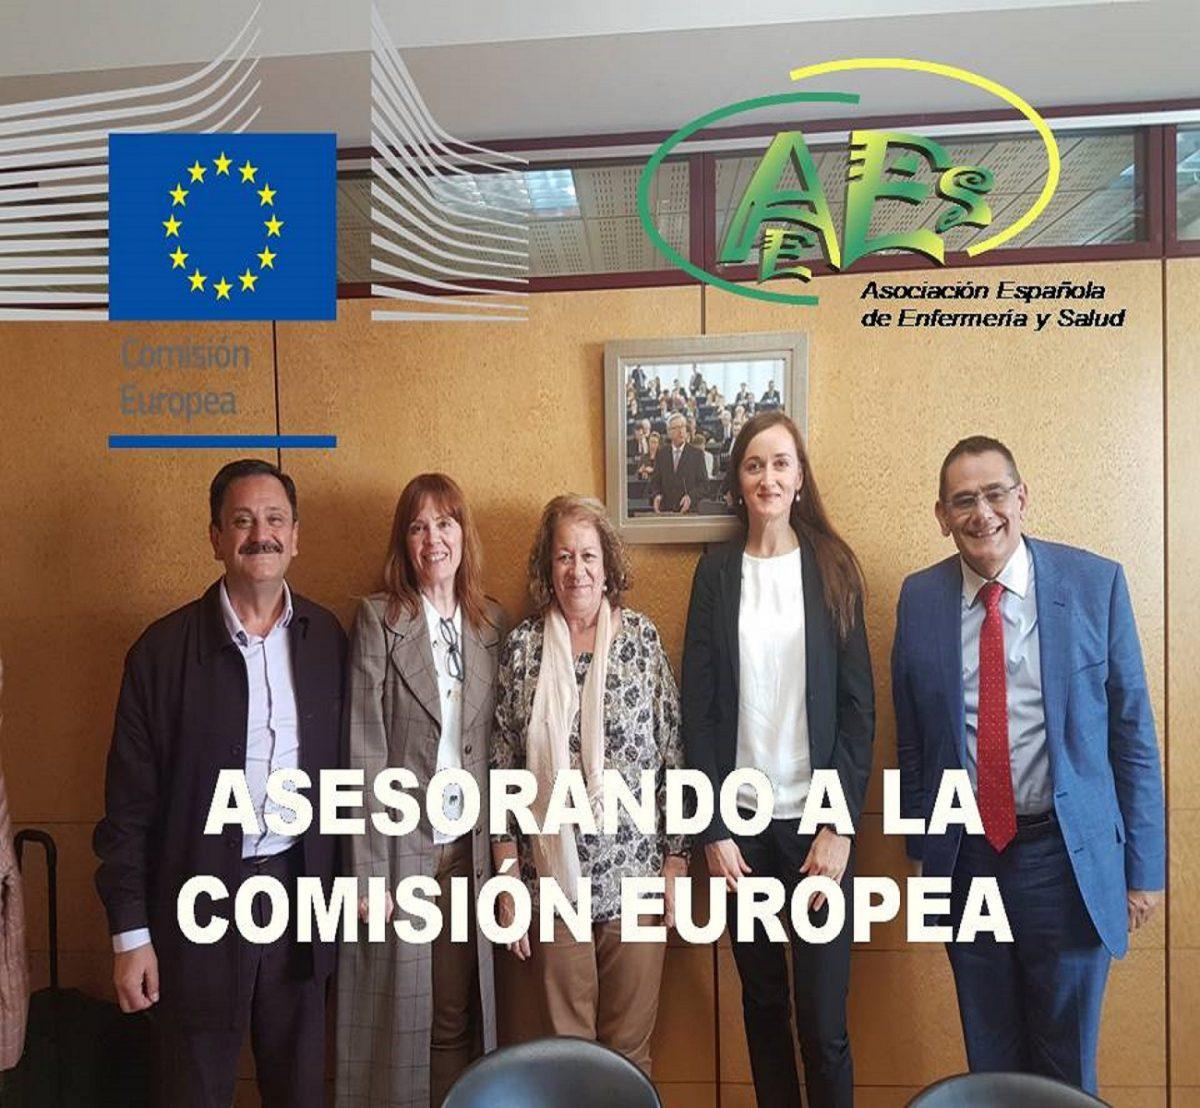 ASESORANDO A LA COMISION EUROPEA